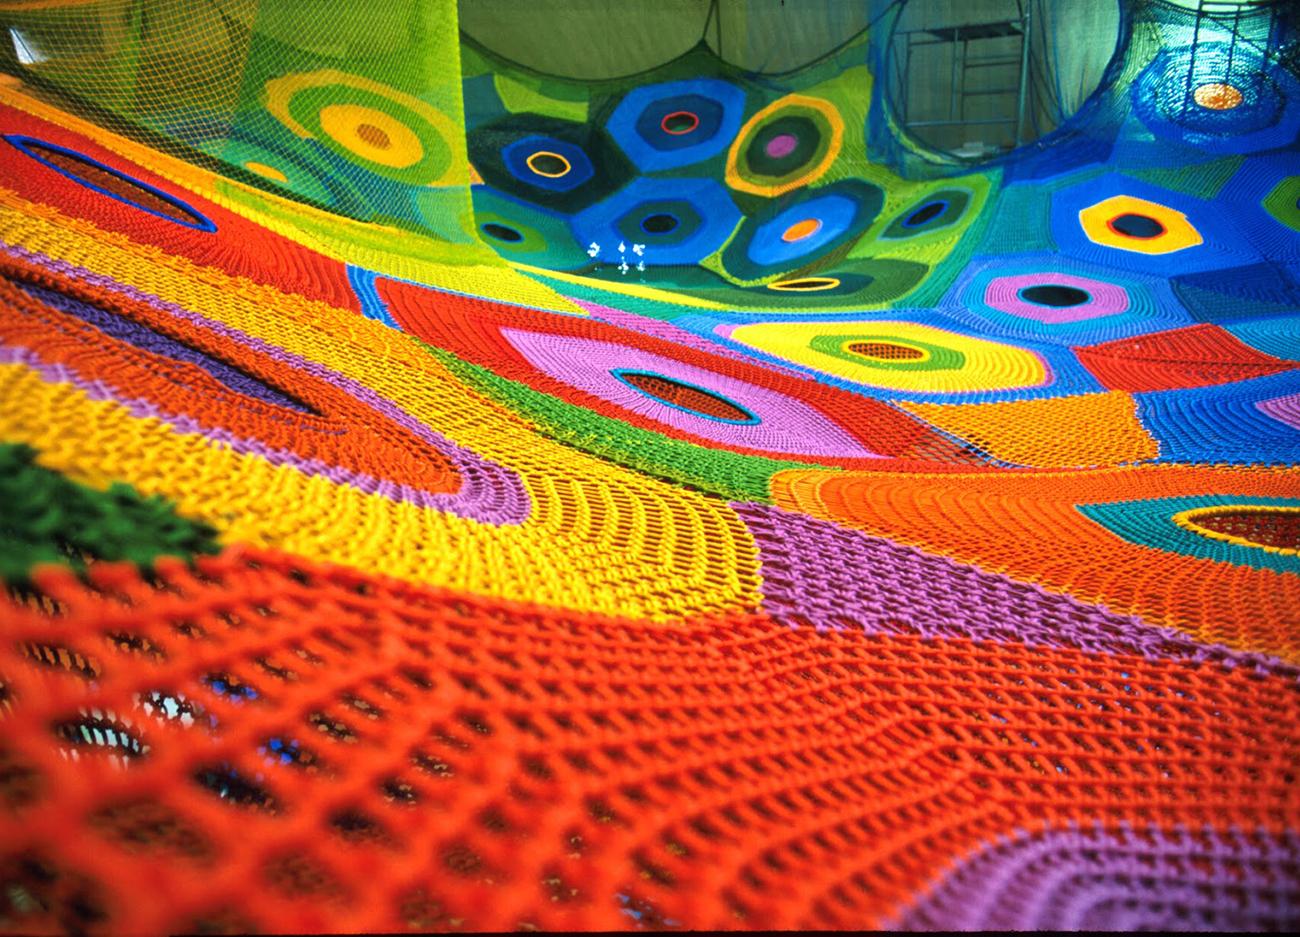 Interactive-Art-Installation-People-Play-Art-Suspended-3C.jpg